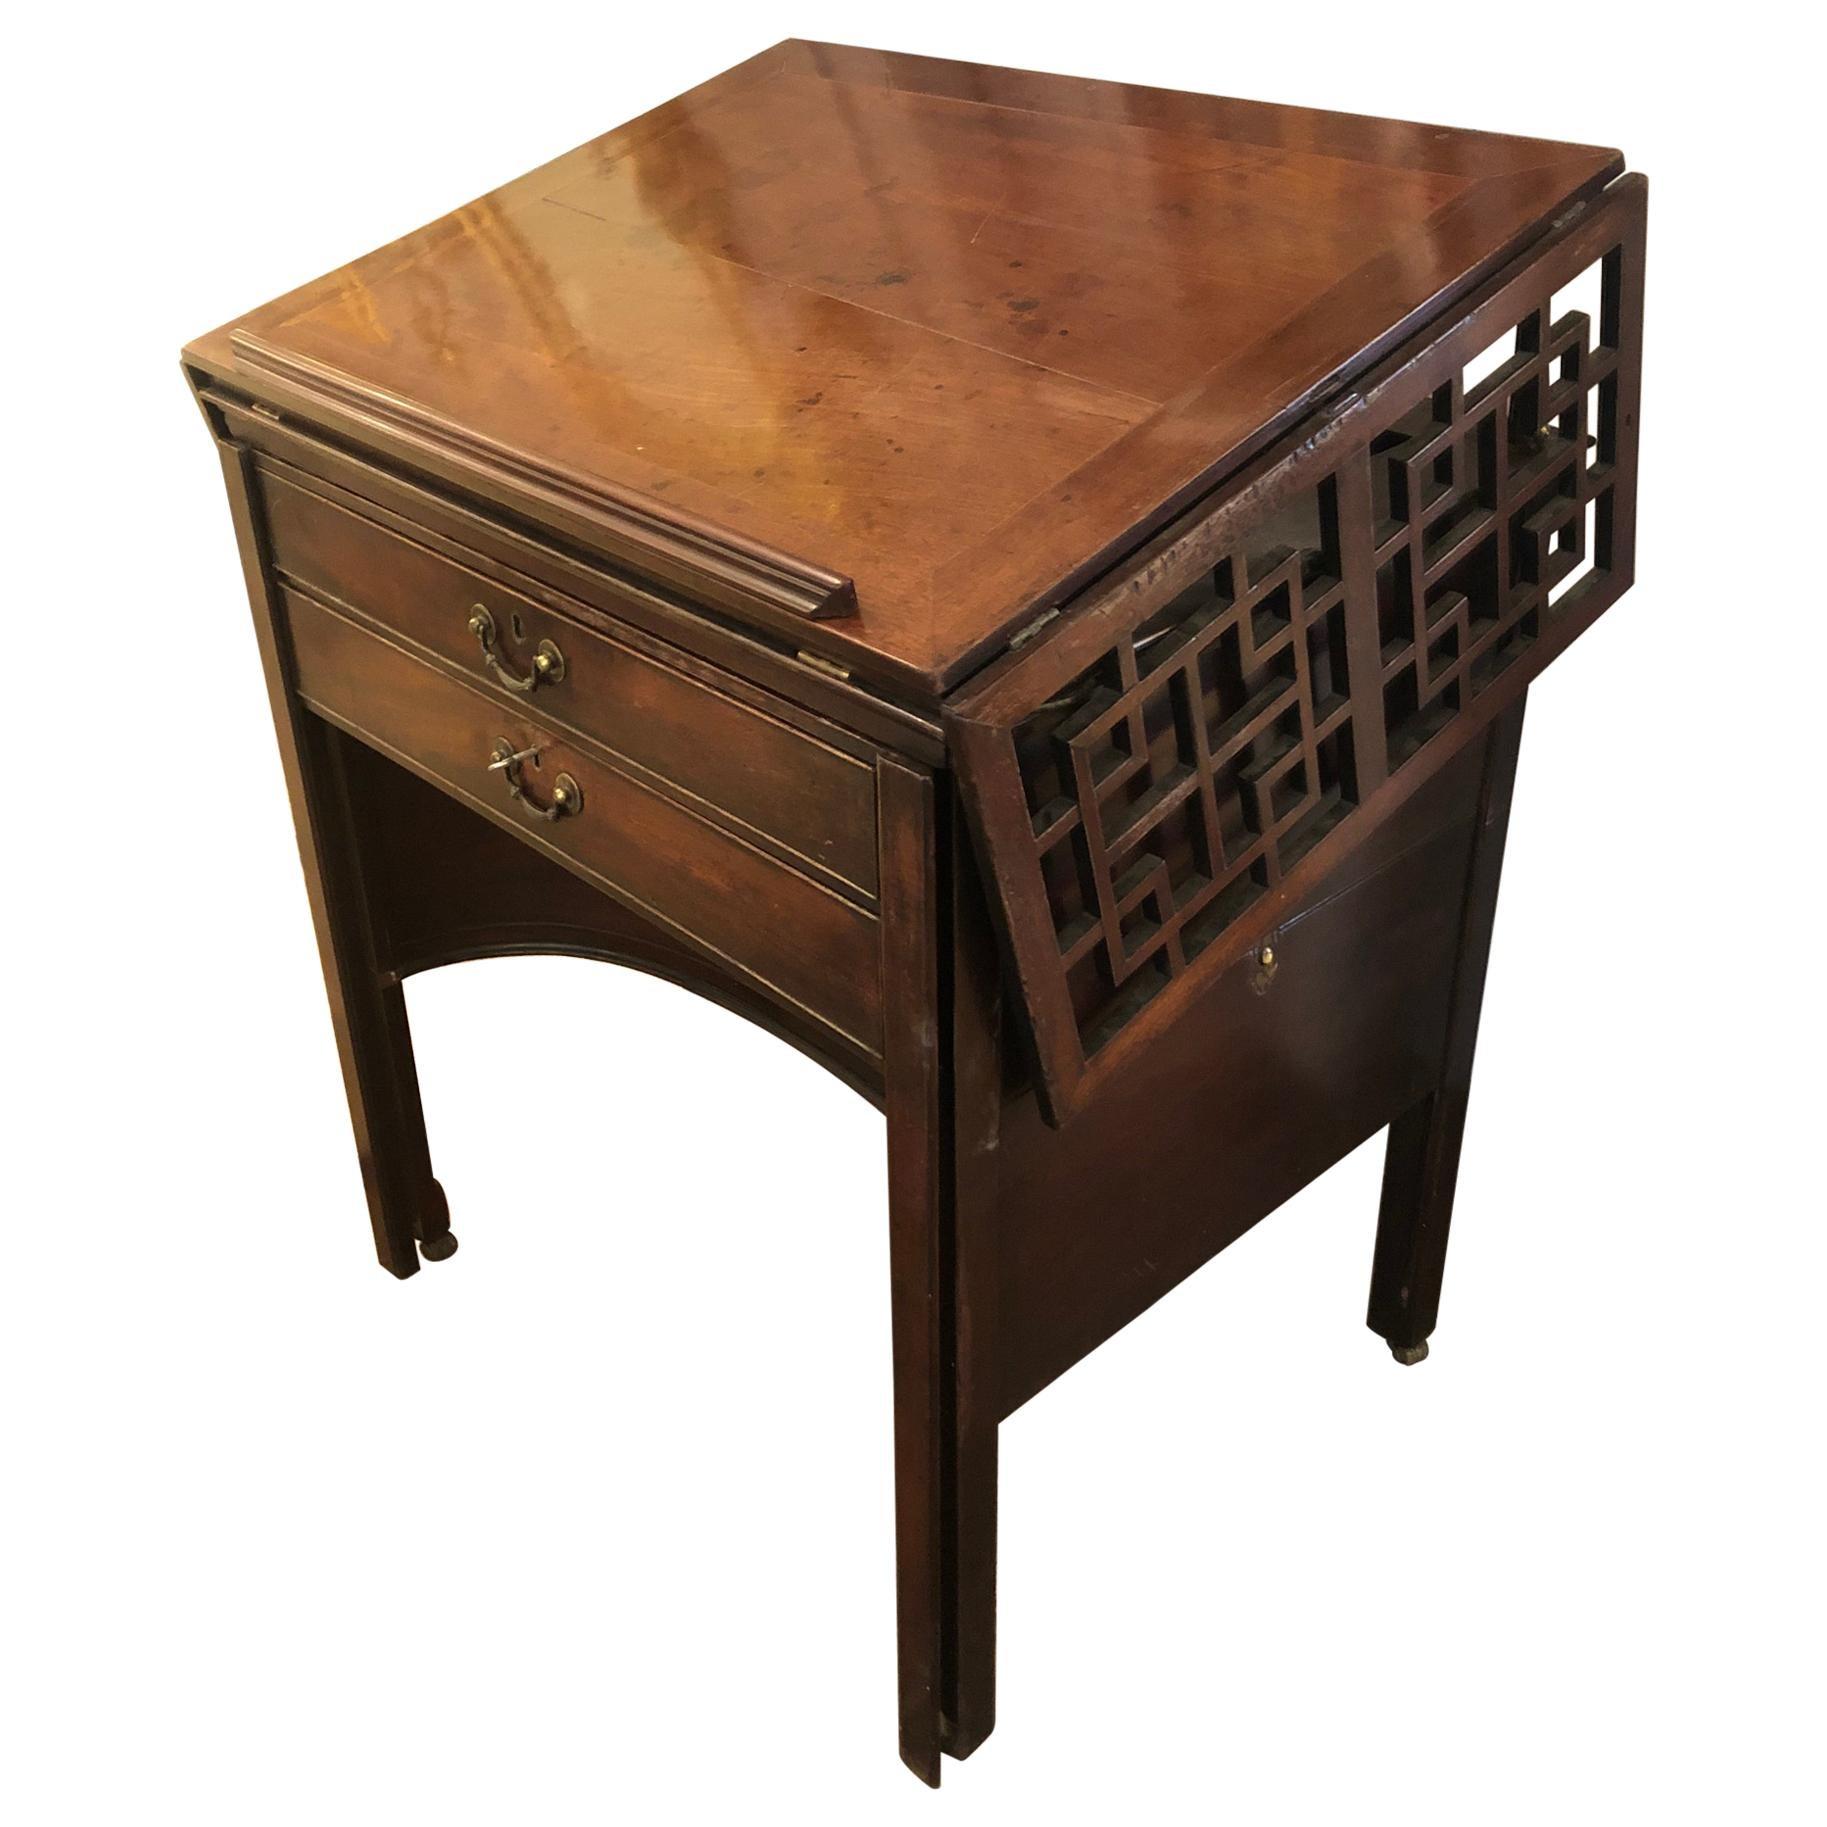 Ingenious & Rare 19th Century Mahogany Mechanical Architect's Desk